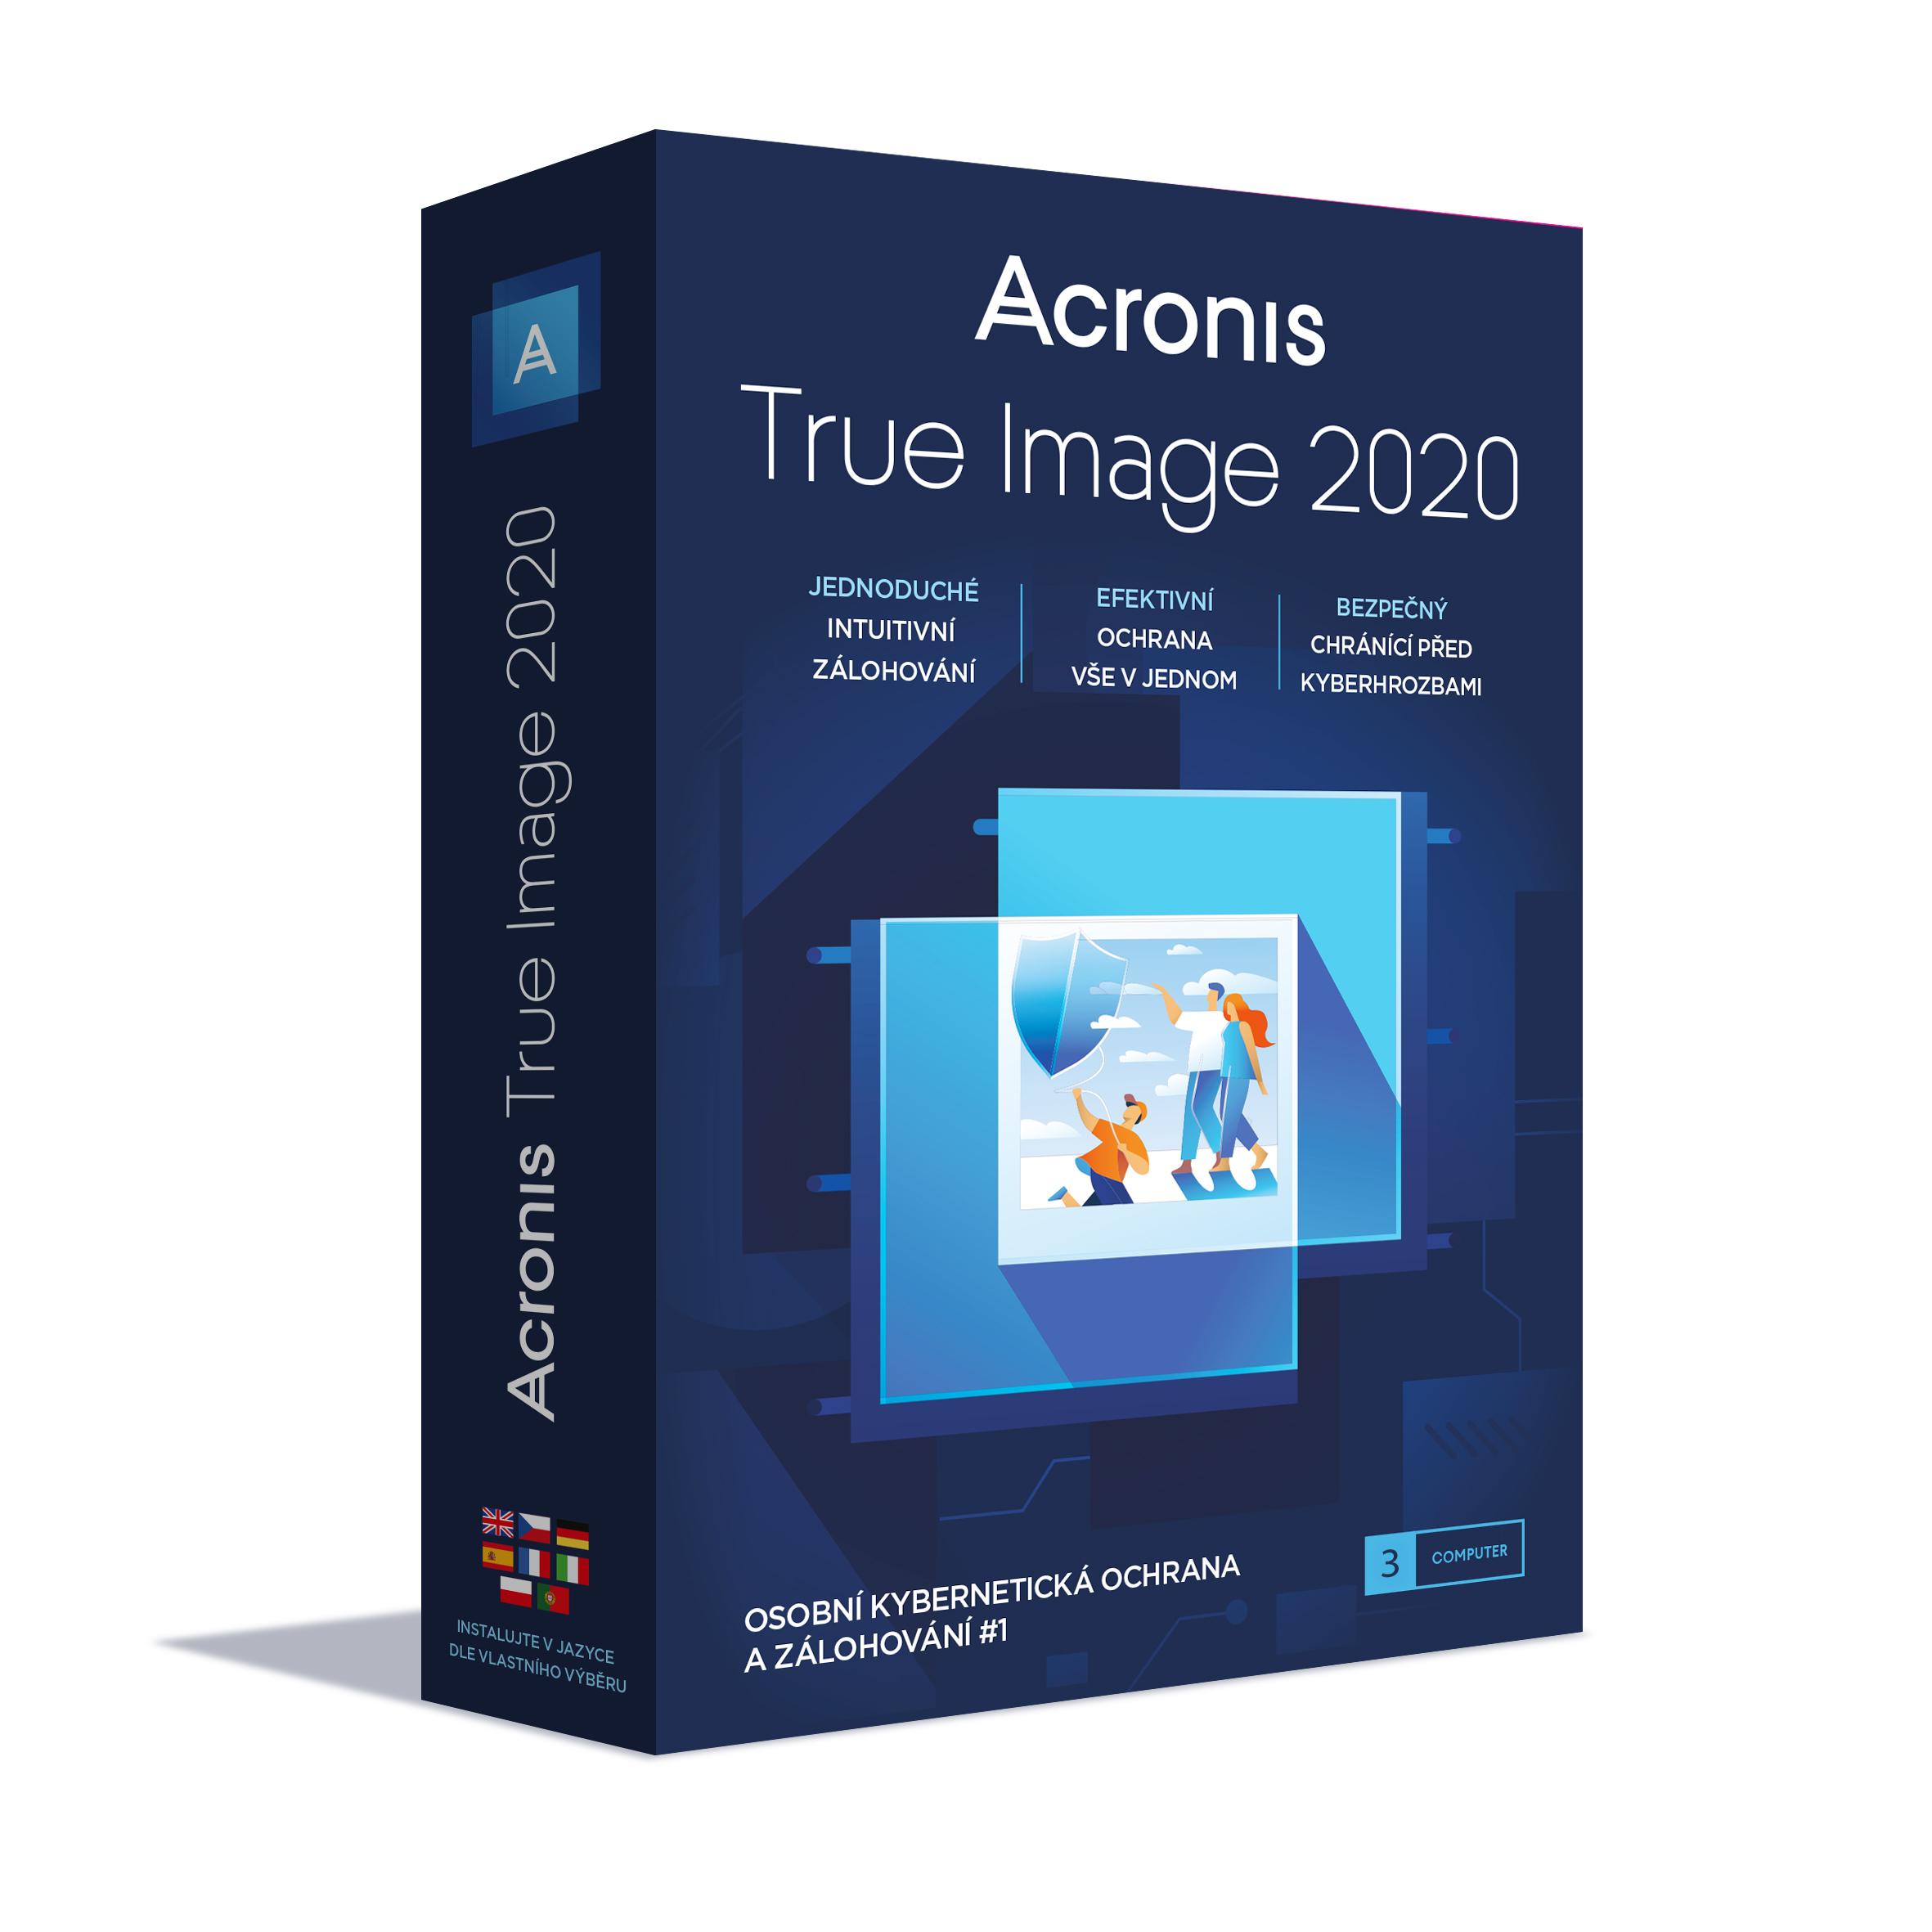 Acronis True Image 2020 - 3 Computers - BOX